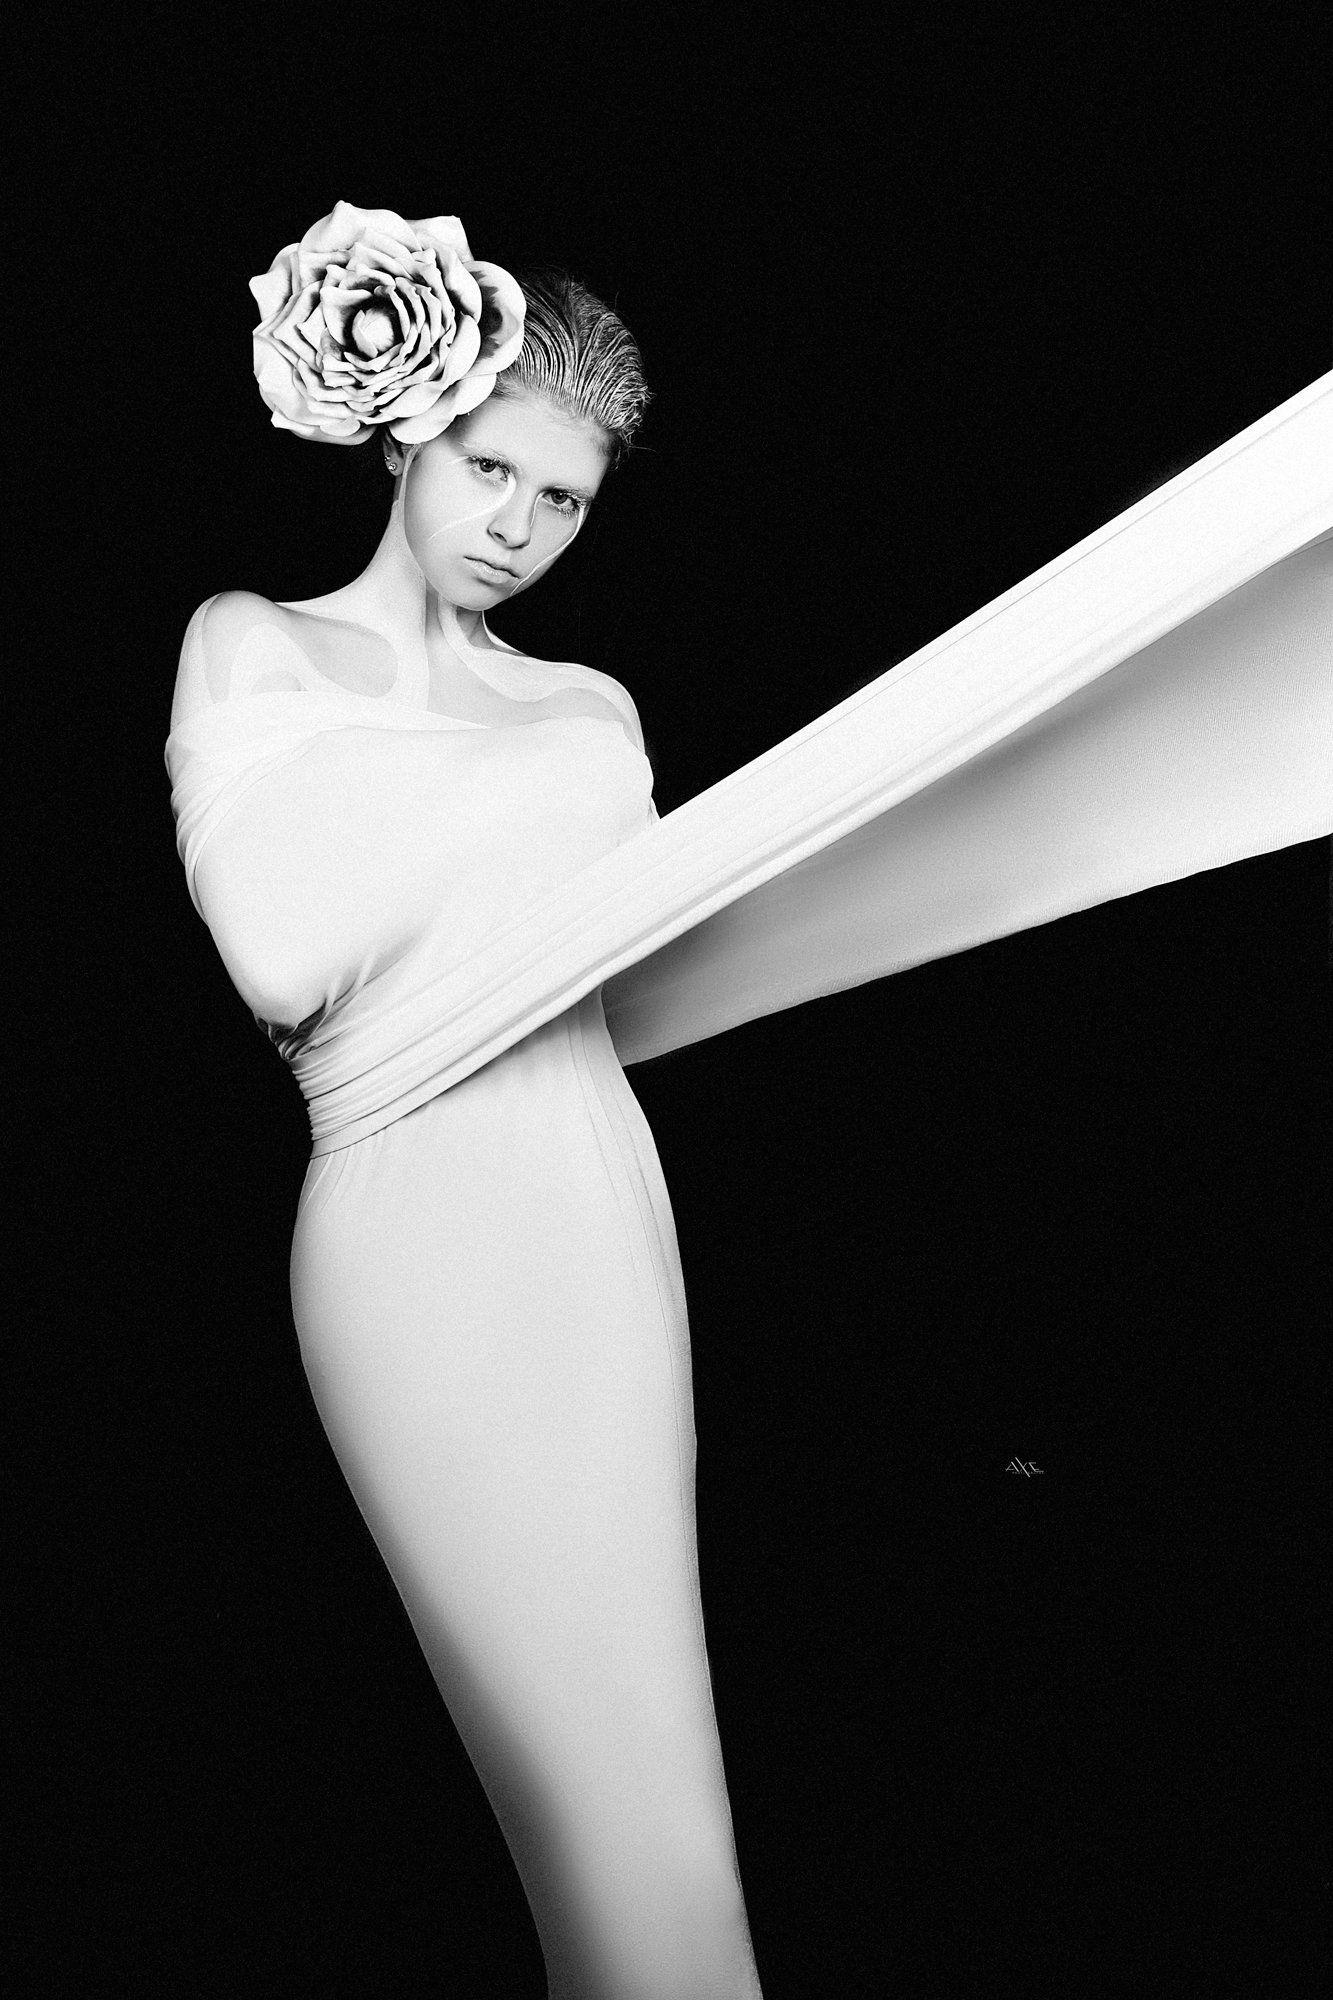 woman, portrait, art, studio, light, conceptual, Руслан Болгов (Axe)